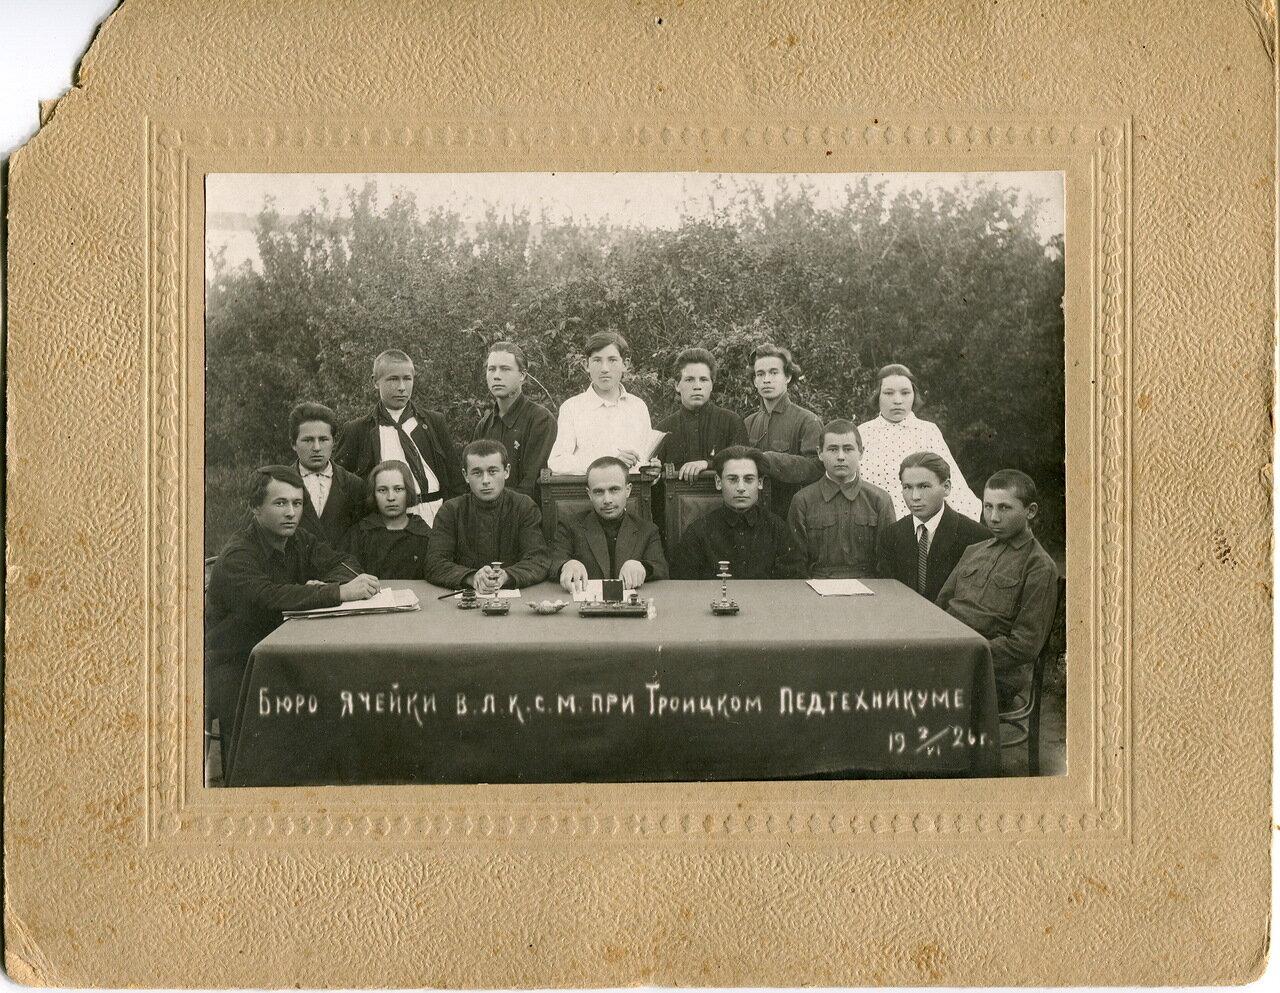 1919-1929.Троицкий татаро-башкирский педагогический техникум. Бюро ячейки ВЛКСМ